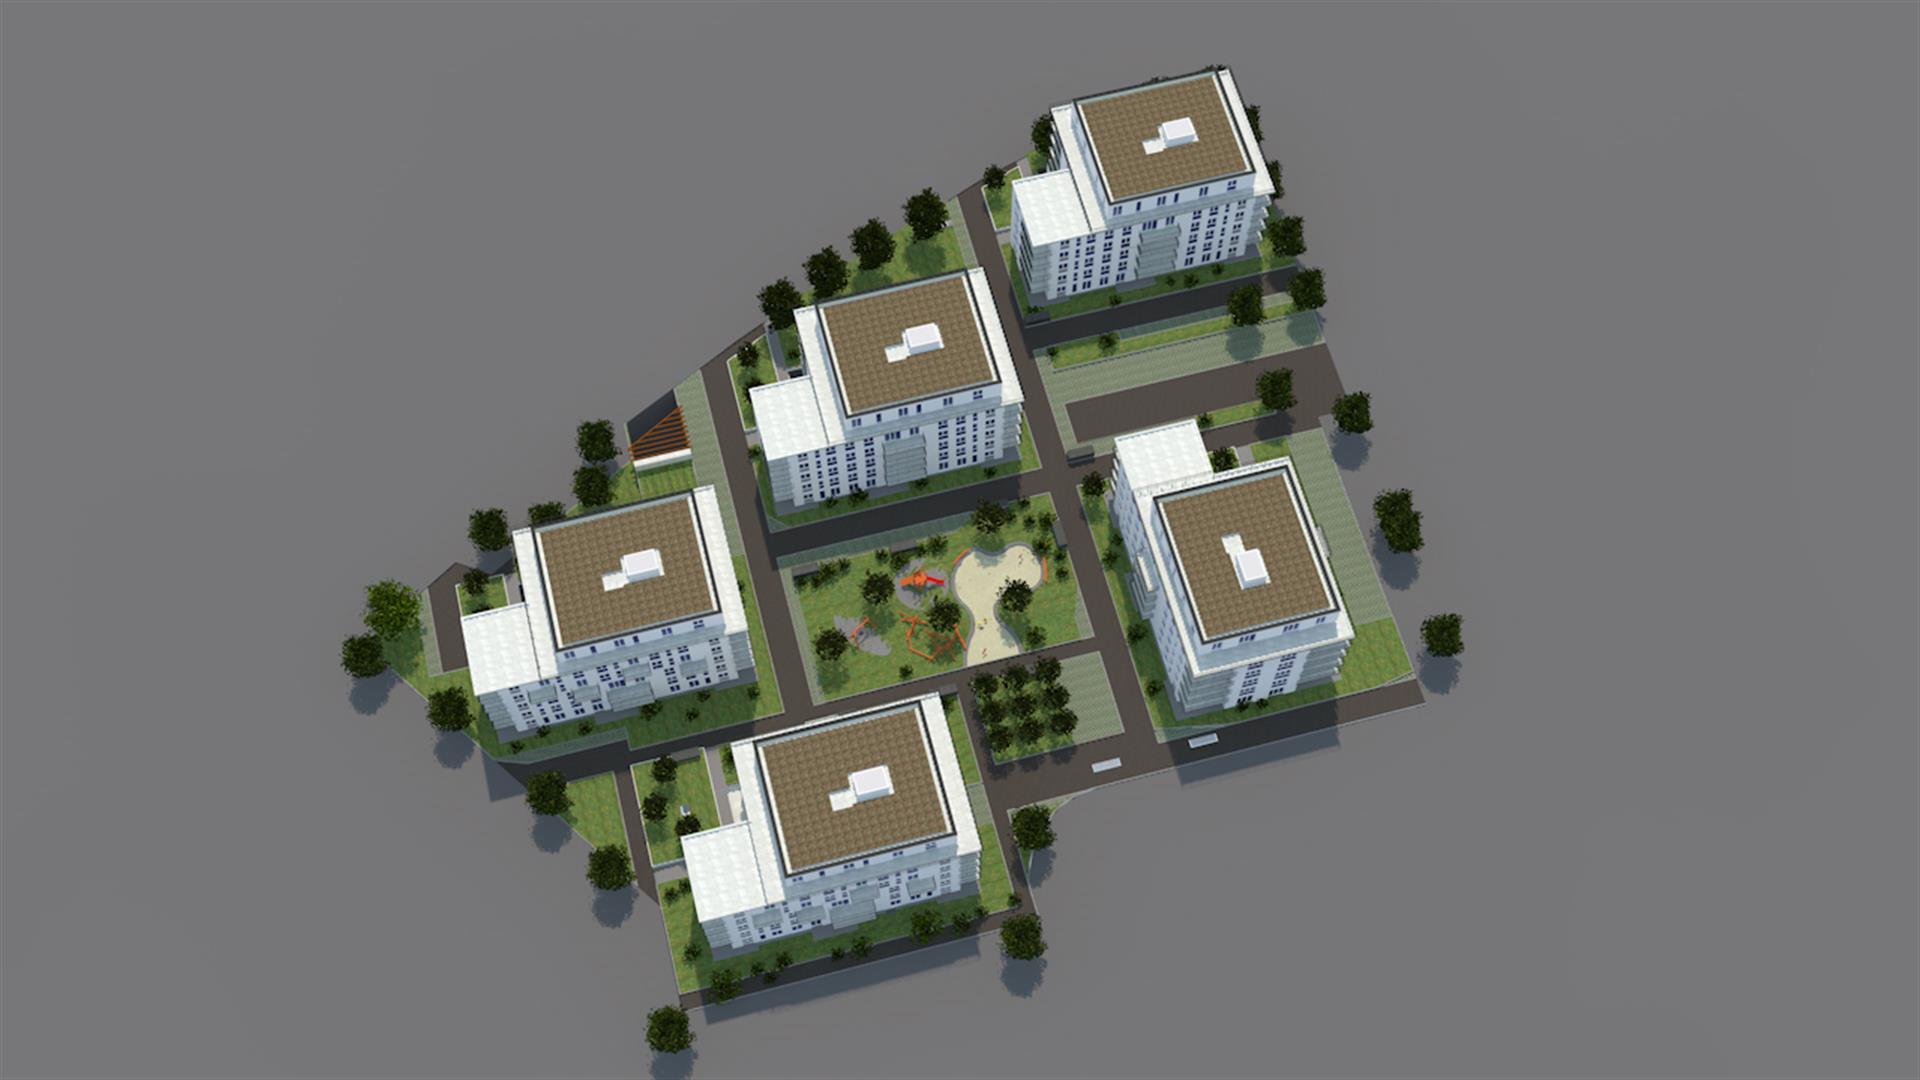 Bauunternehmen Mannheim bauunternehmen mannheim hausdesign pro